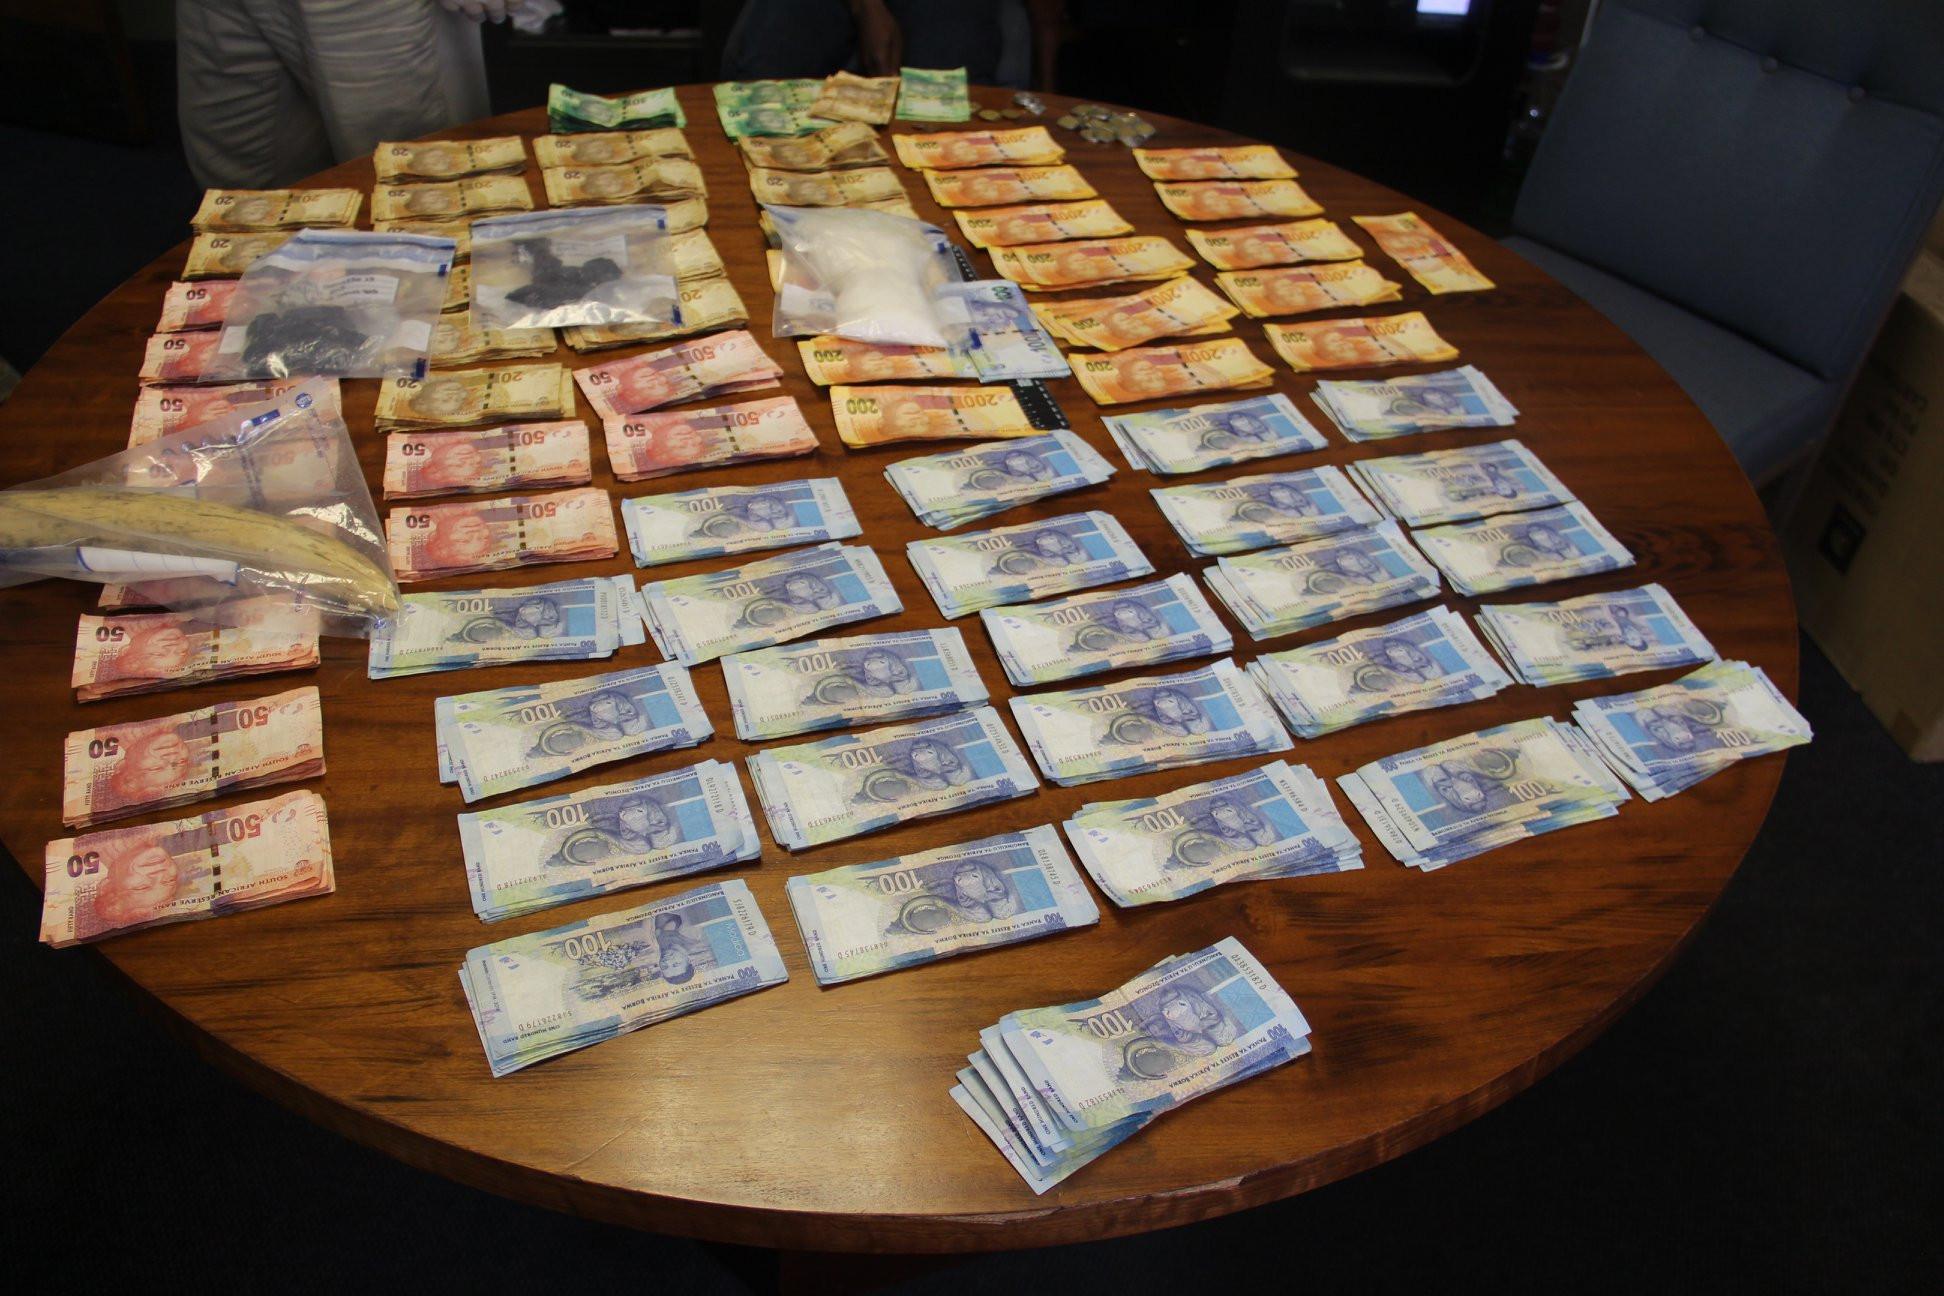 Alleged notorious Nigerian drug dealer arrested in South Africa